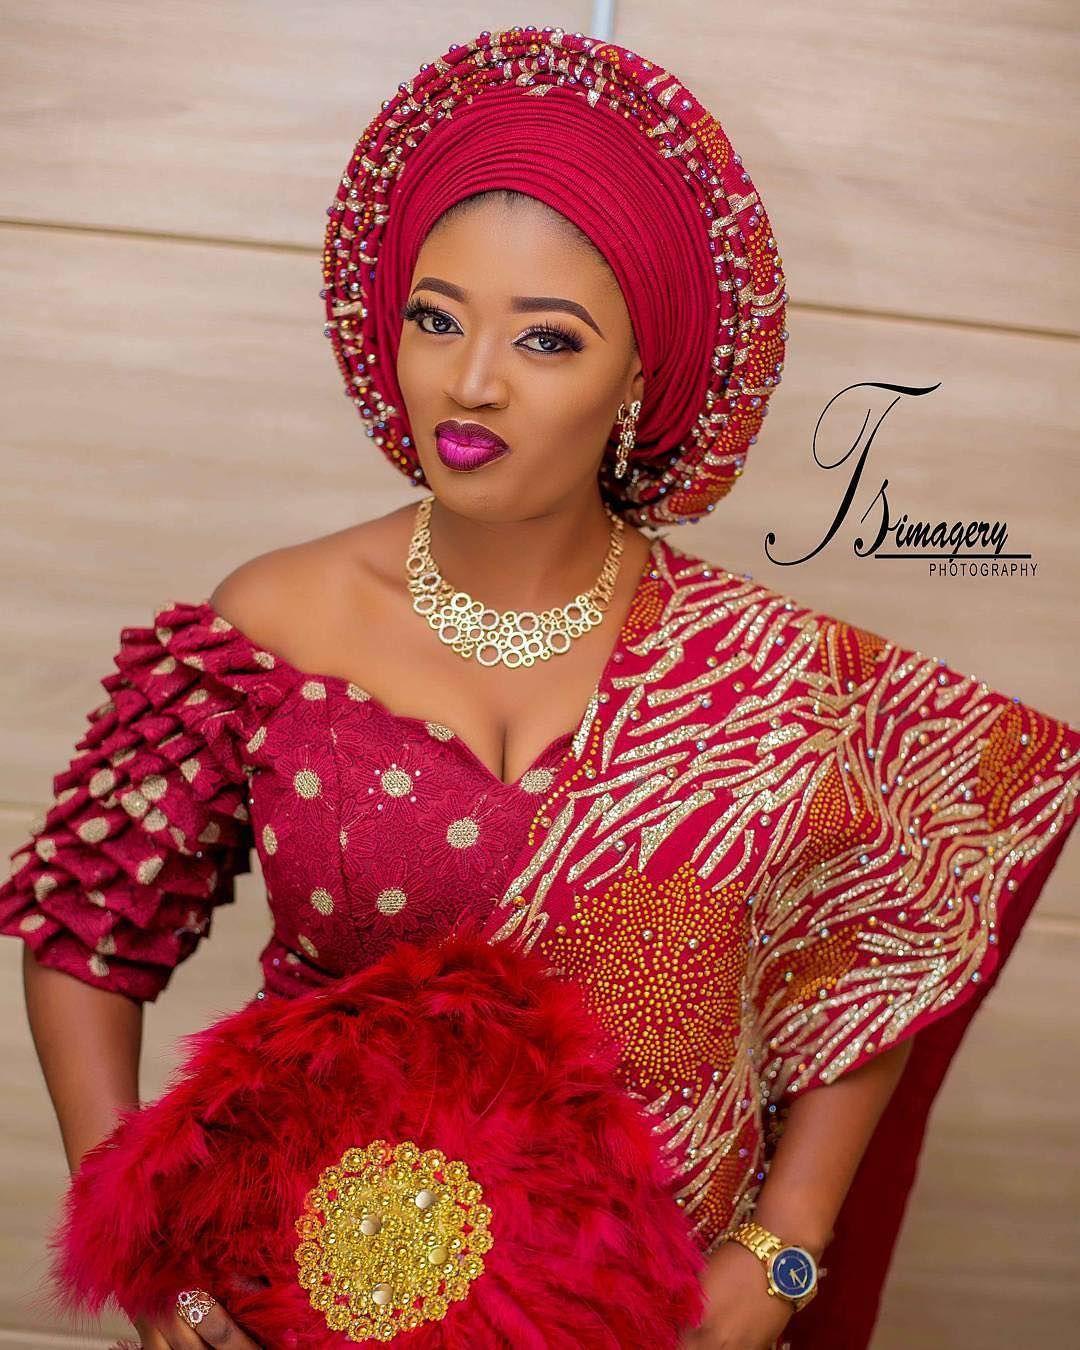 Fine Wine Mayofade Asoebi Asoebispecial Speciallovers Makeup Thearox20 African Dresses For Kids African Dresses For Women African Inspired Fashion